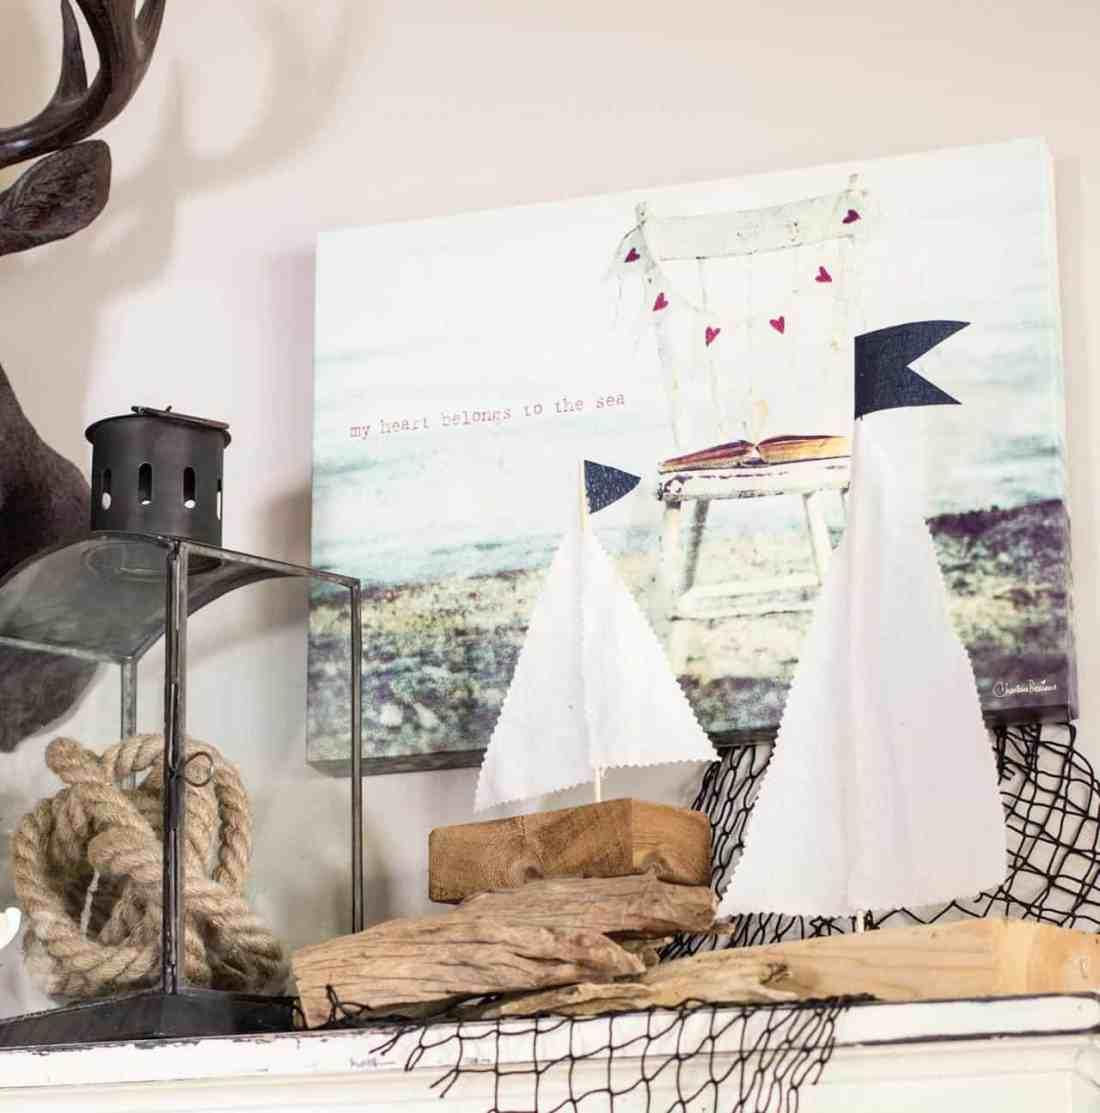 DIY wood sailboats on shelf with lantern, fishing net, rope, etc as decor